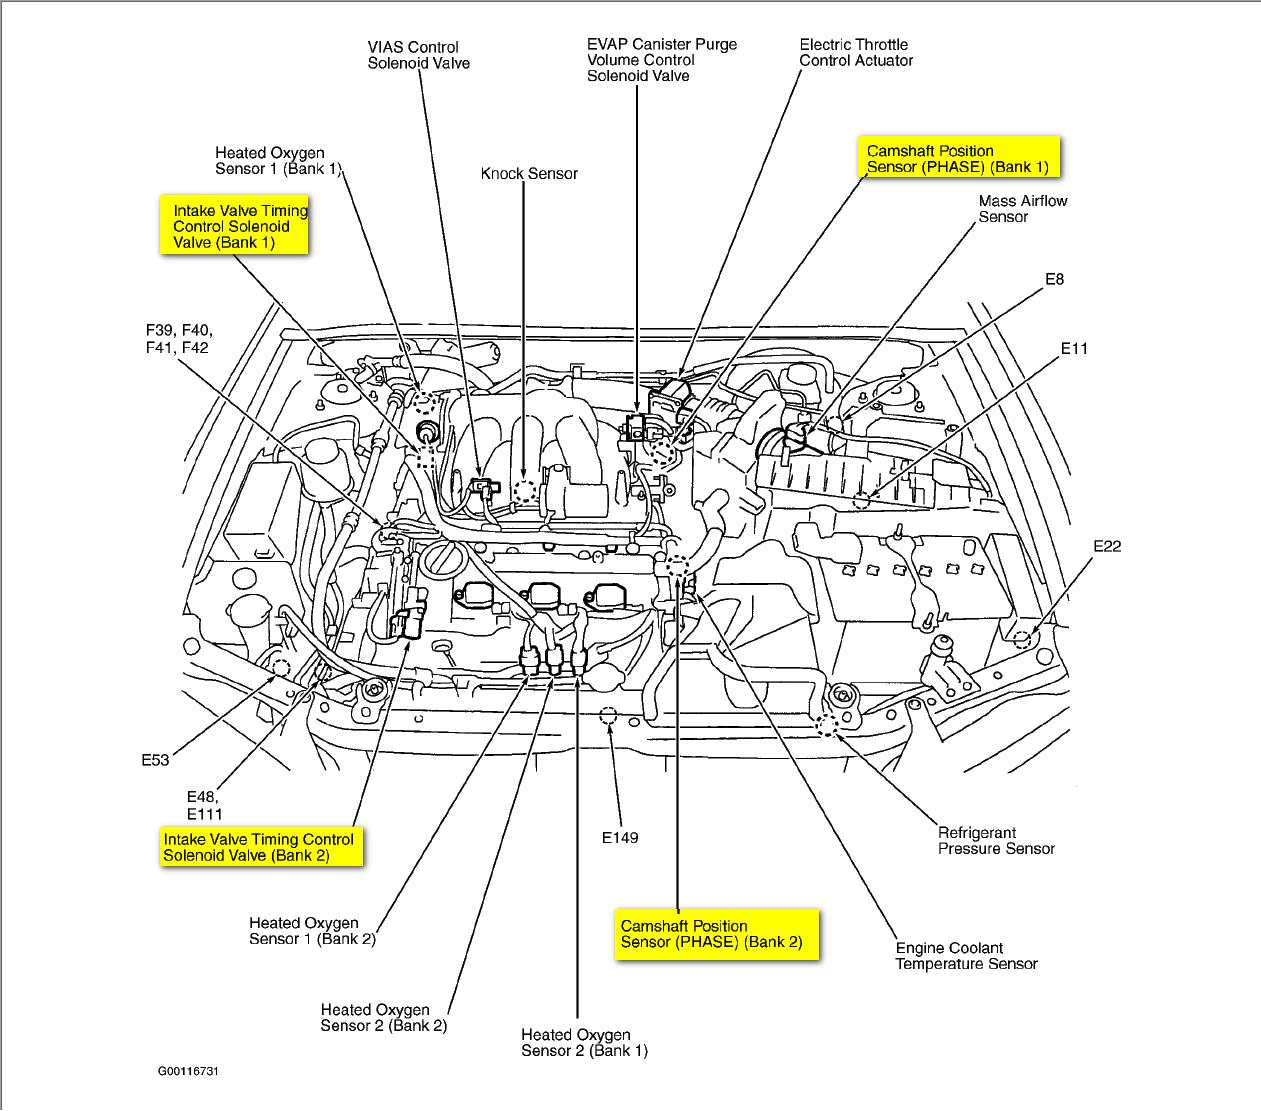 wiring diagram for 2002 nissan altima ne 7626  nissan 2 5 engine diagram  ne 7626  nissan 2 5 engine diagram